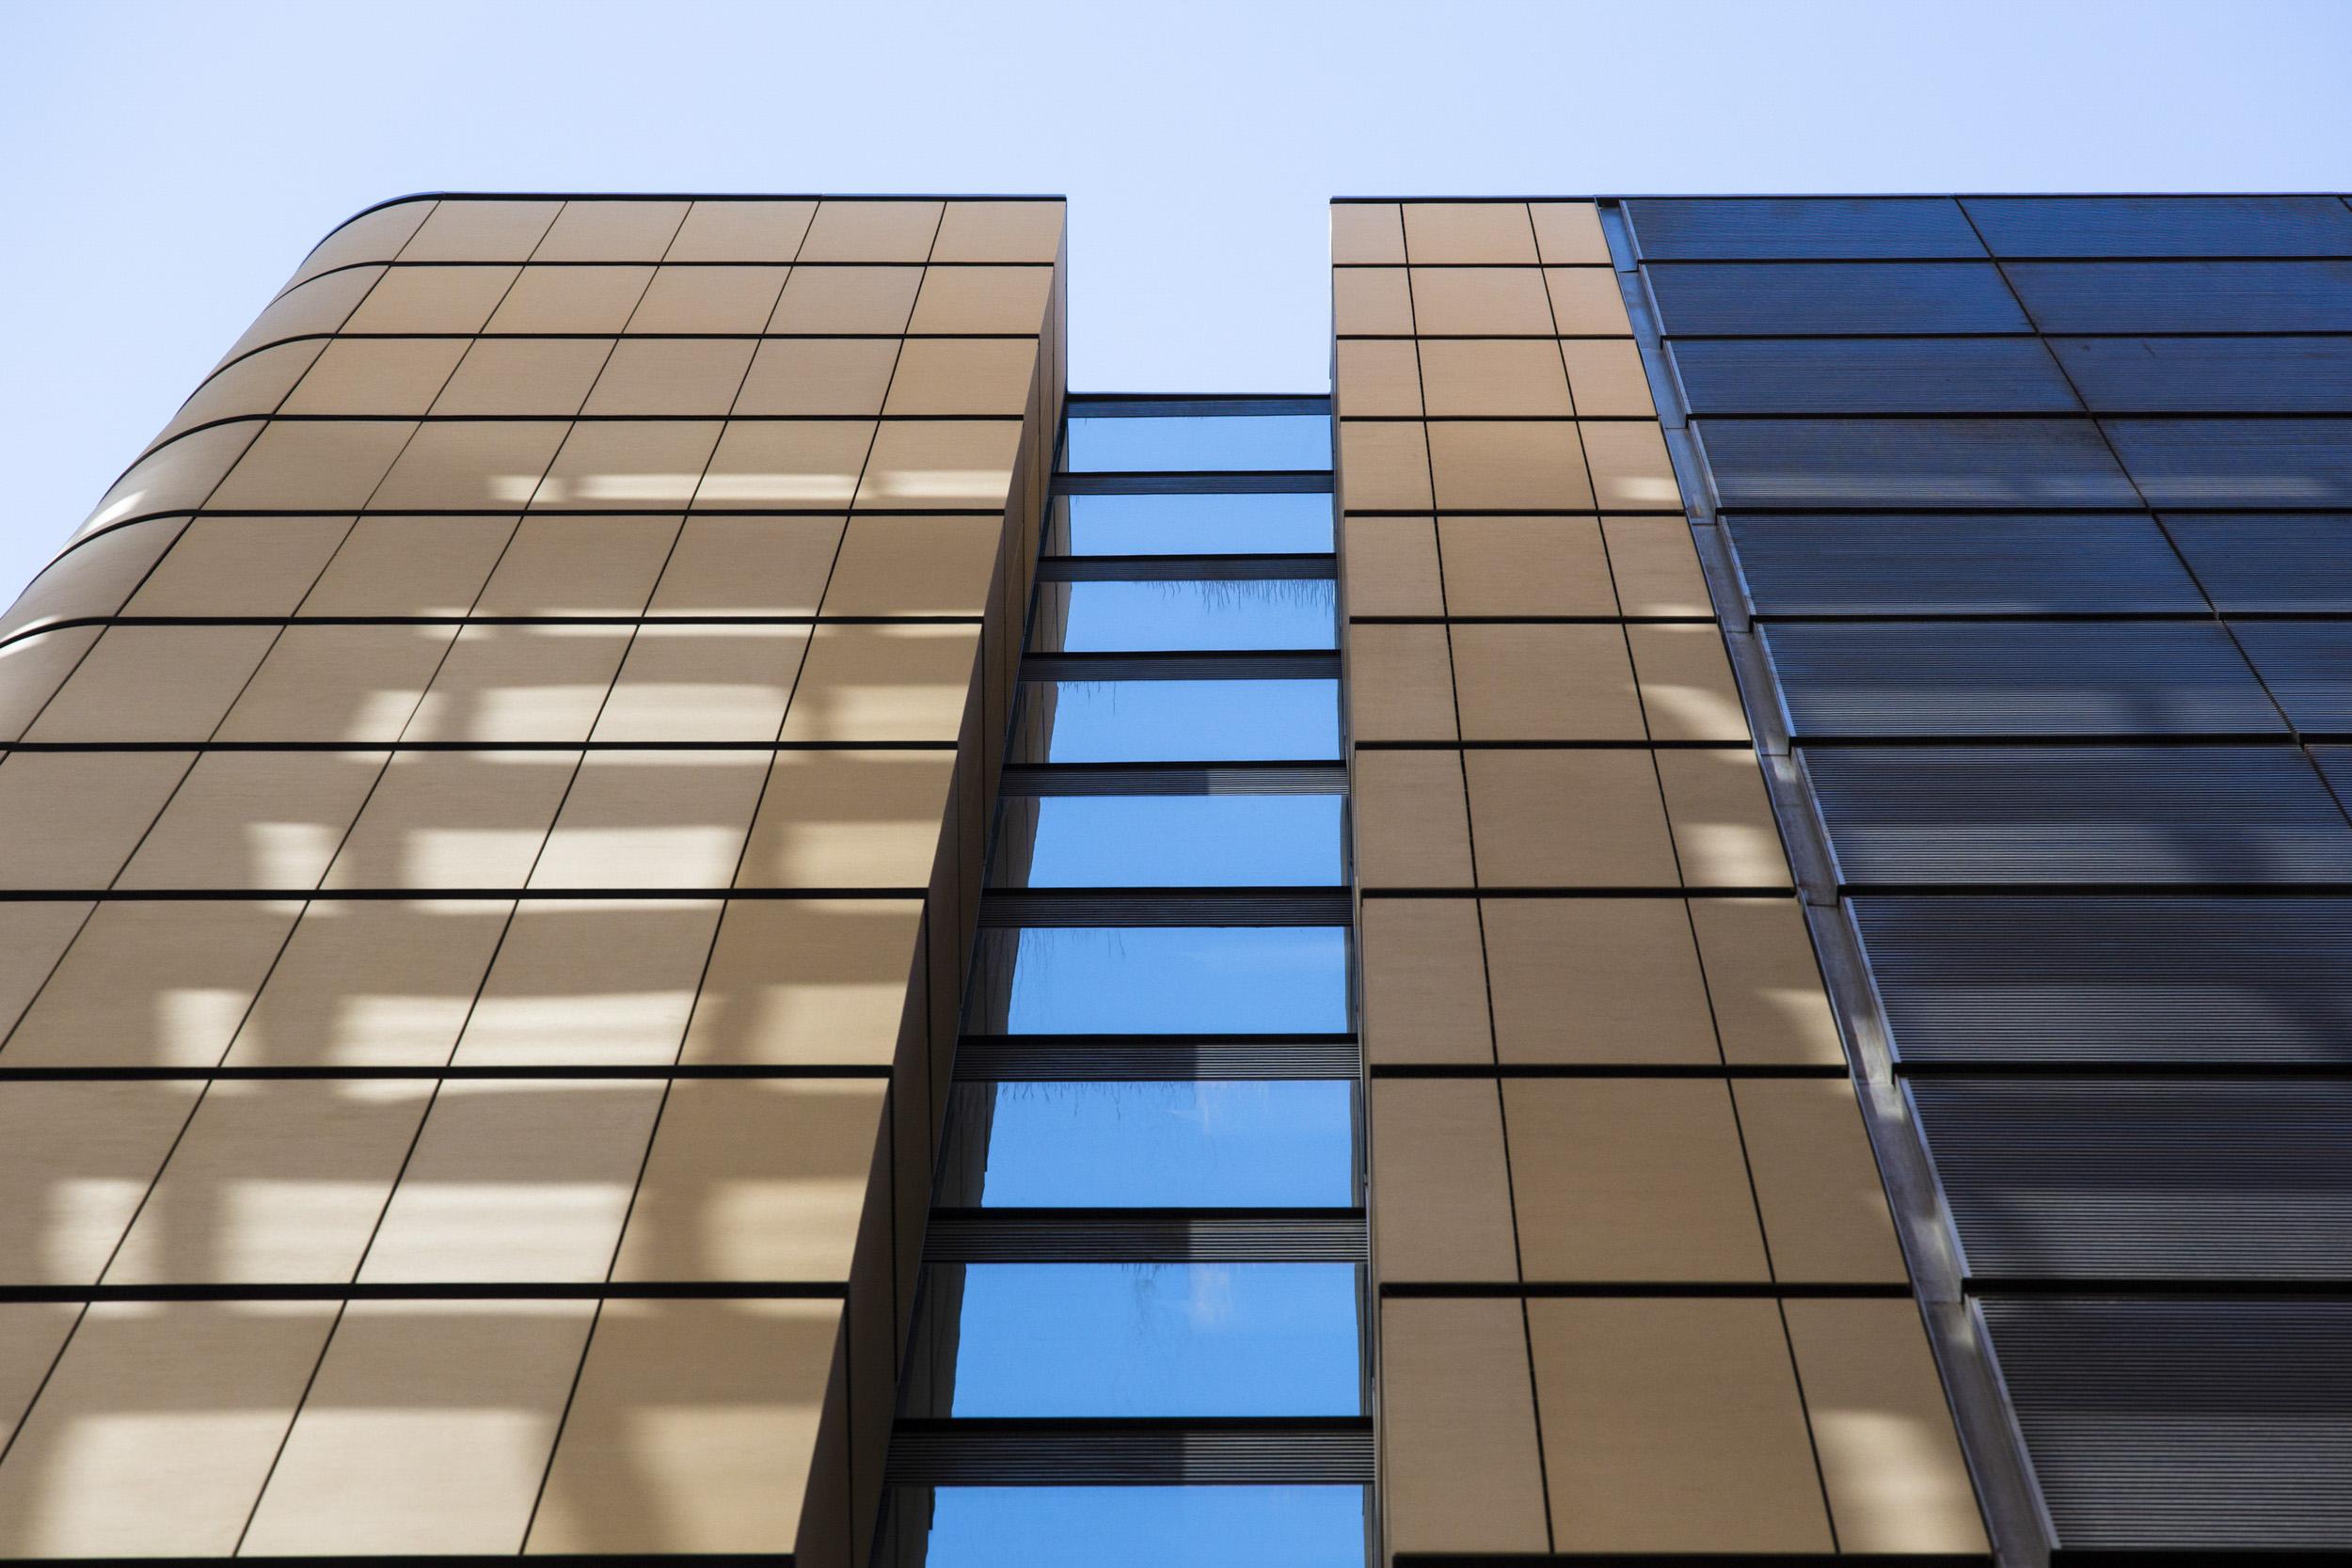 hirise_architecture_sydney_australia_25.jpg